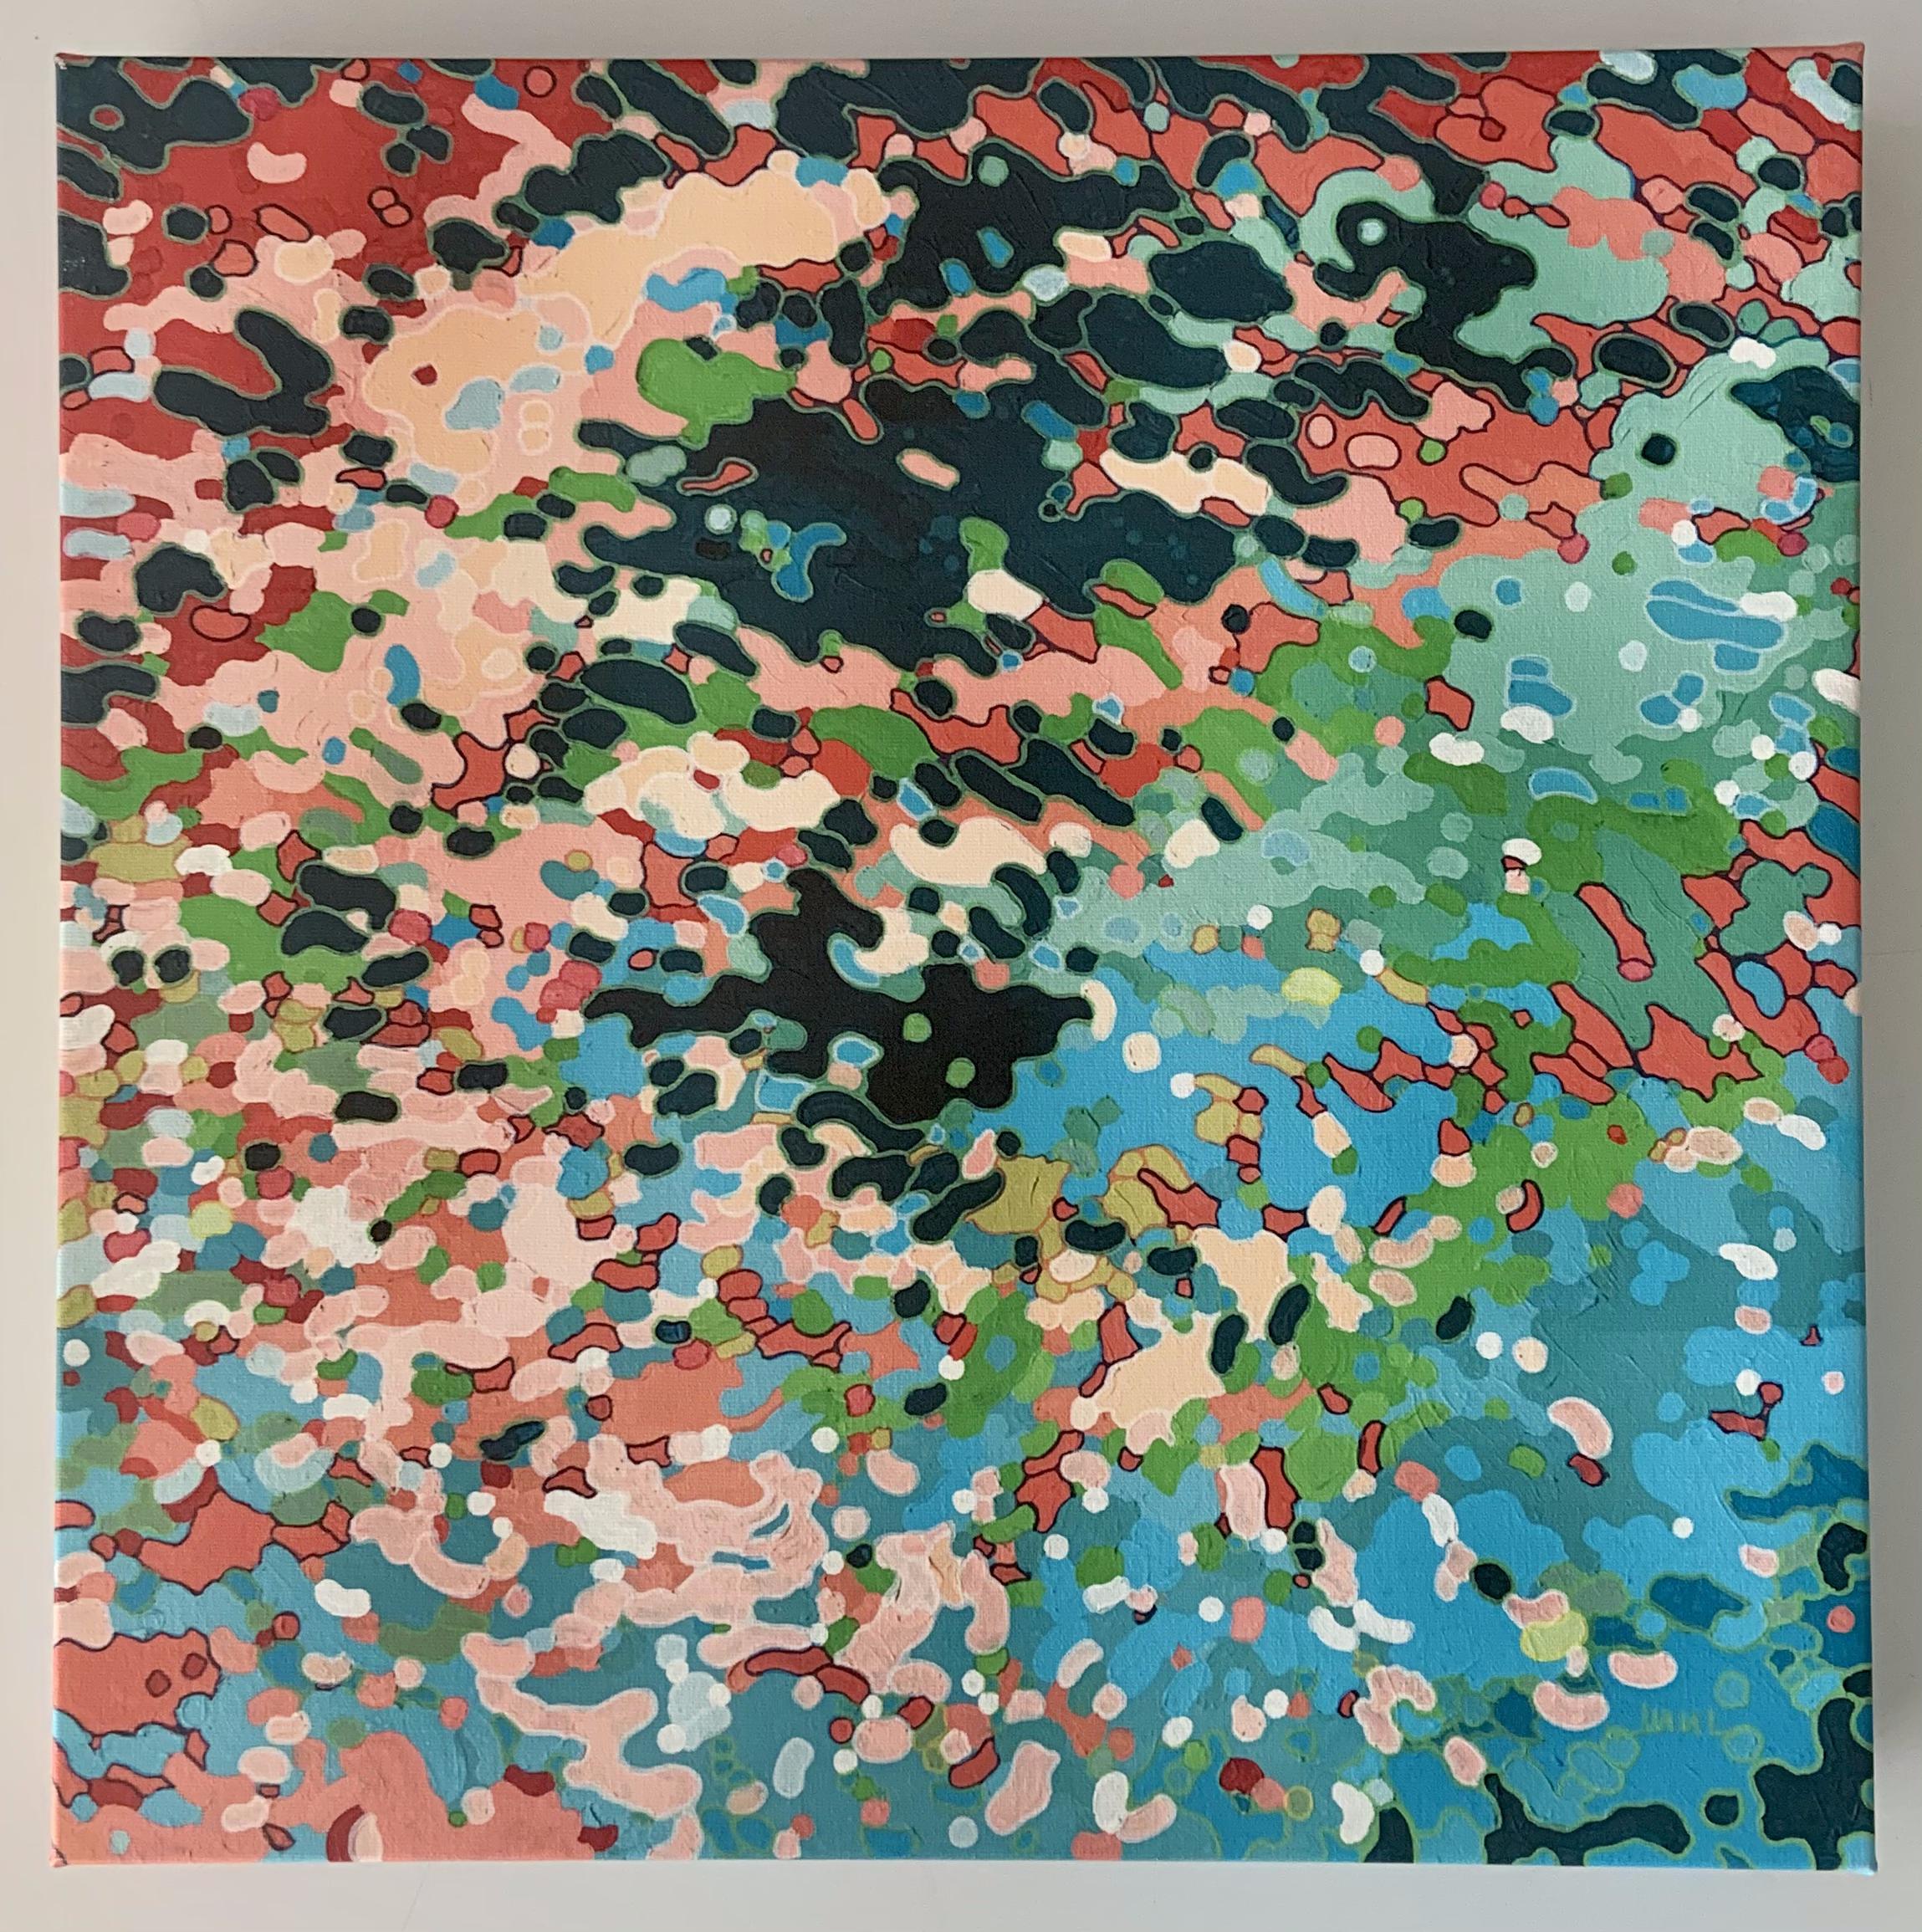 Meandering canvas